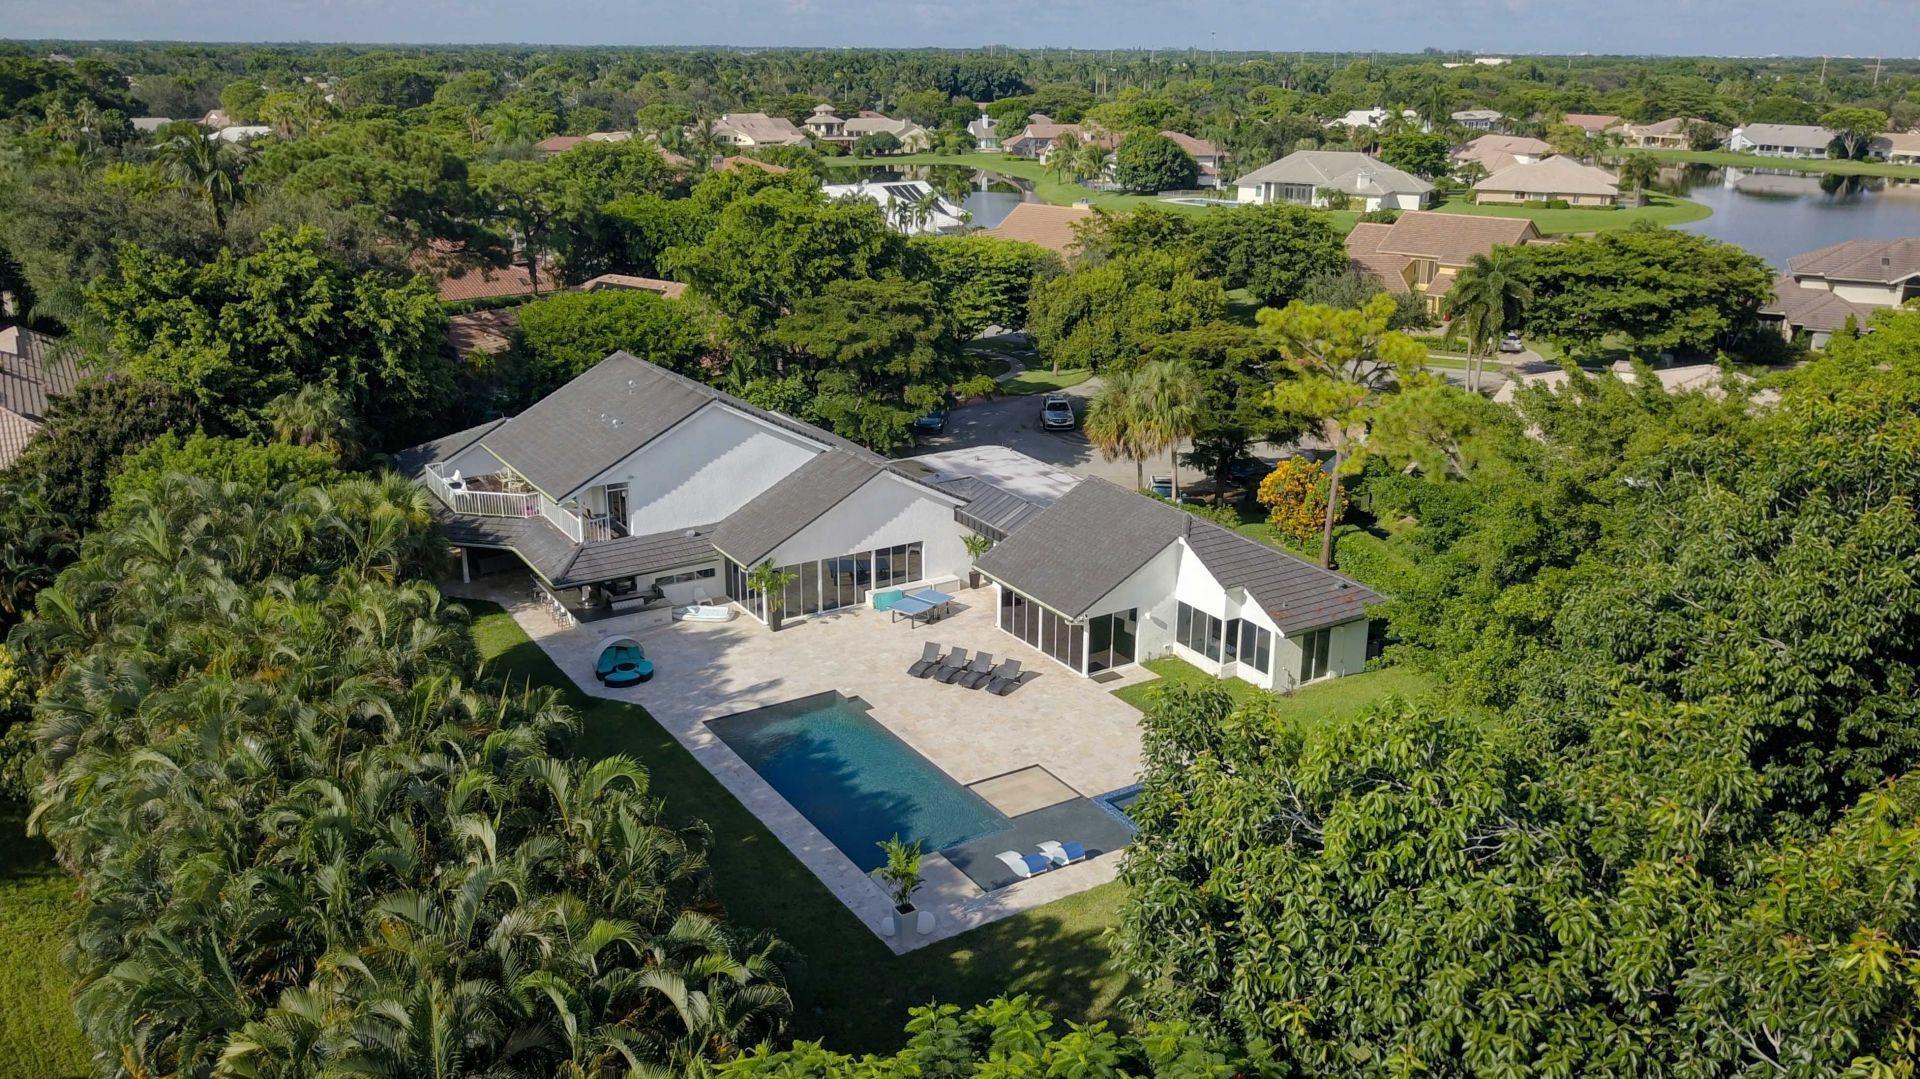 Photo of 3265 Trafalger Circle, Boca Raton, FL 33434